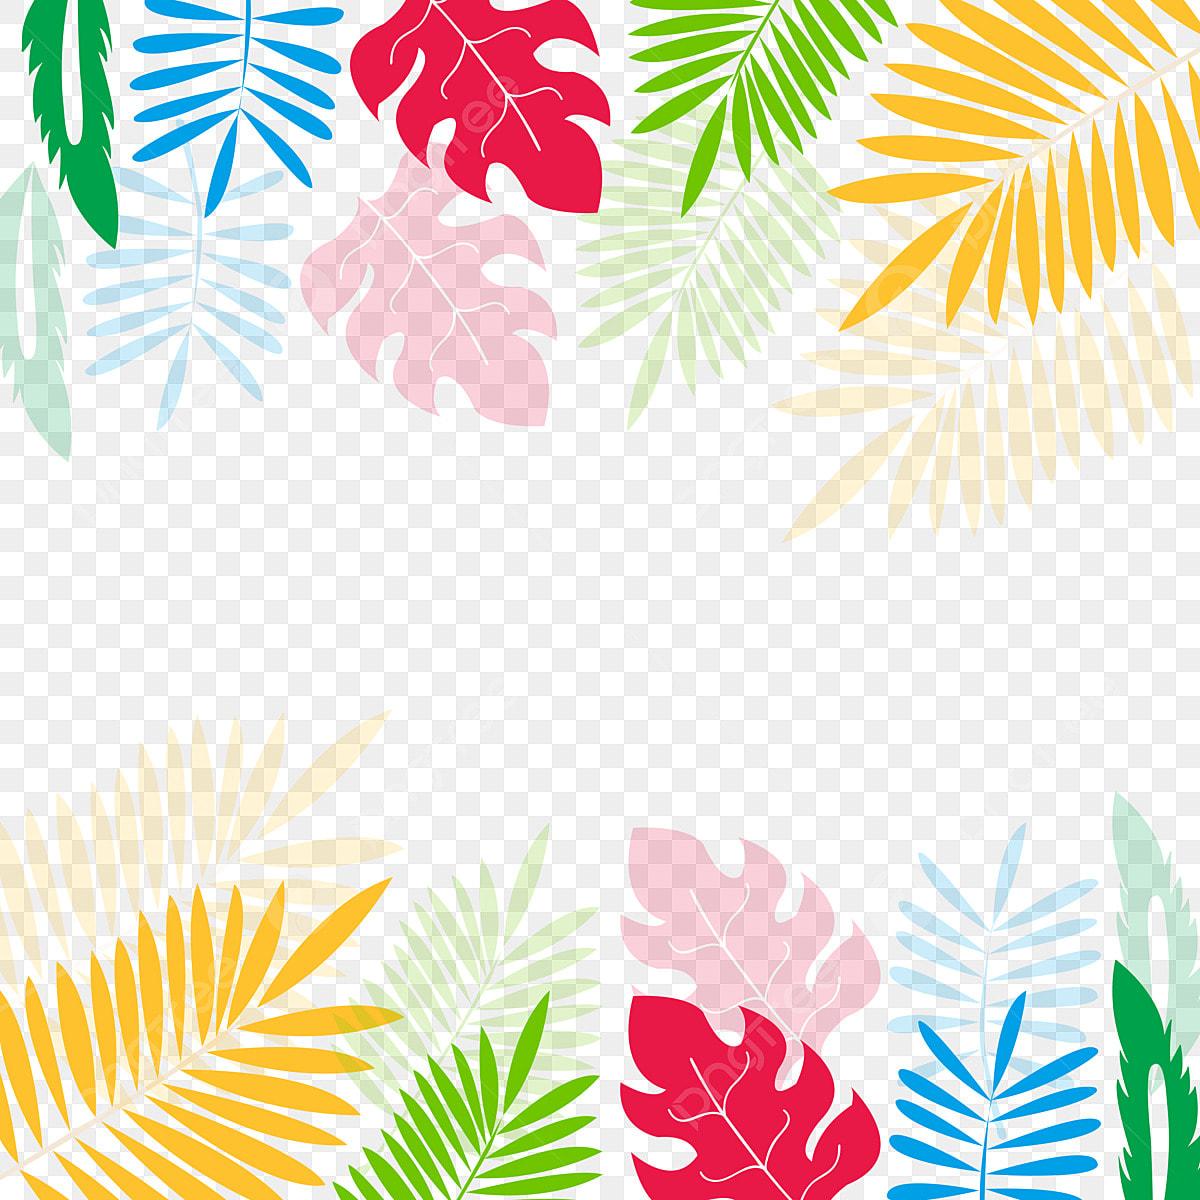 Digital Watercolor Tropical Leaf Watercolor Clipart Summer Clipart Greenery Clipart Jungle Clipart Palm Leaf Watercolor Floral Clipart